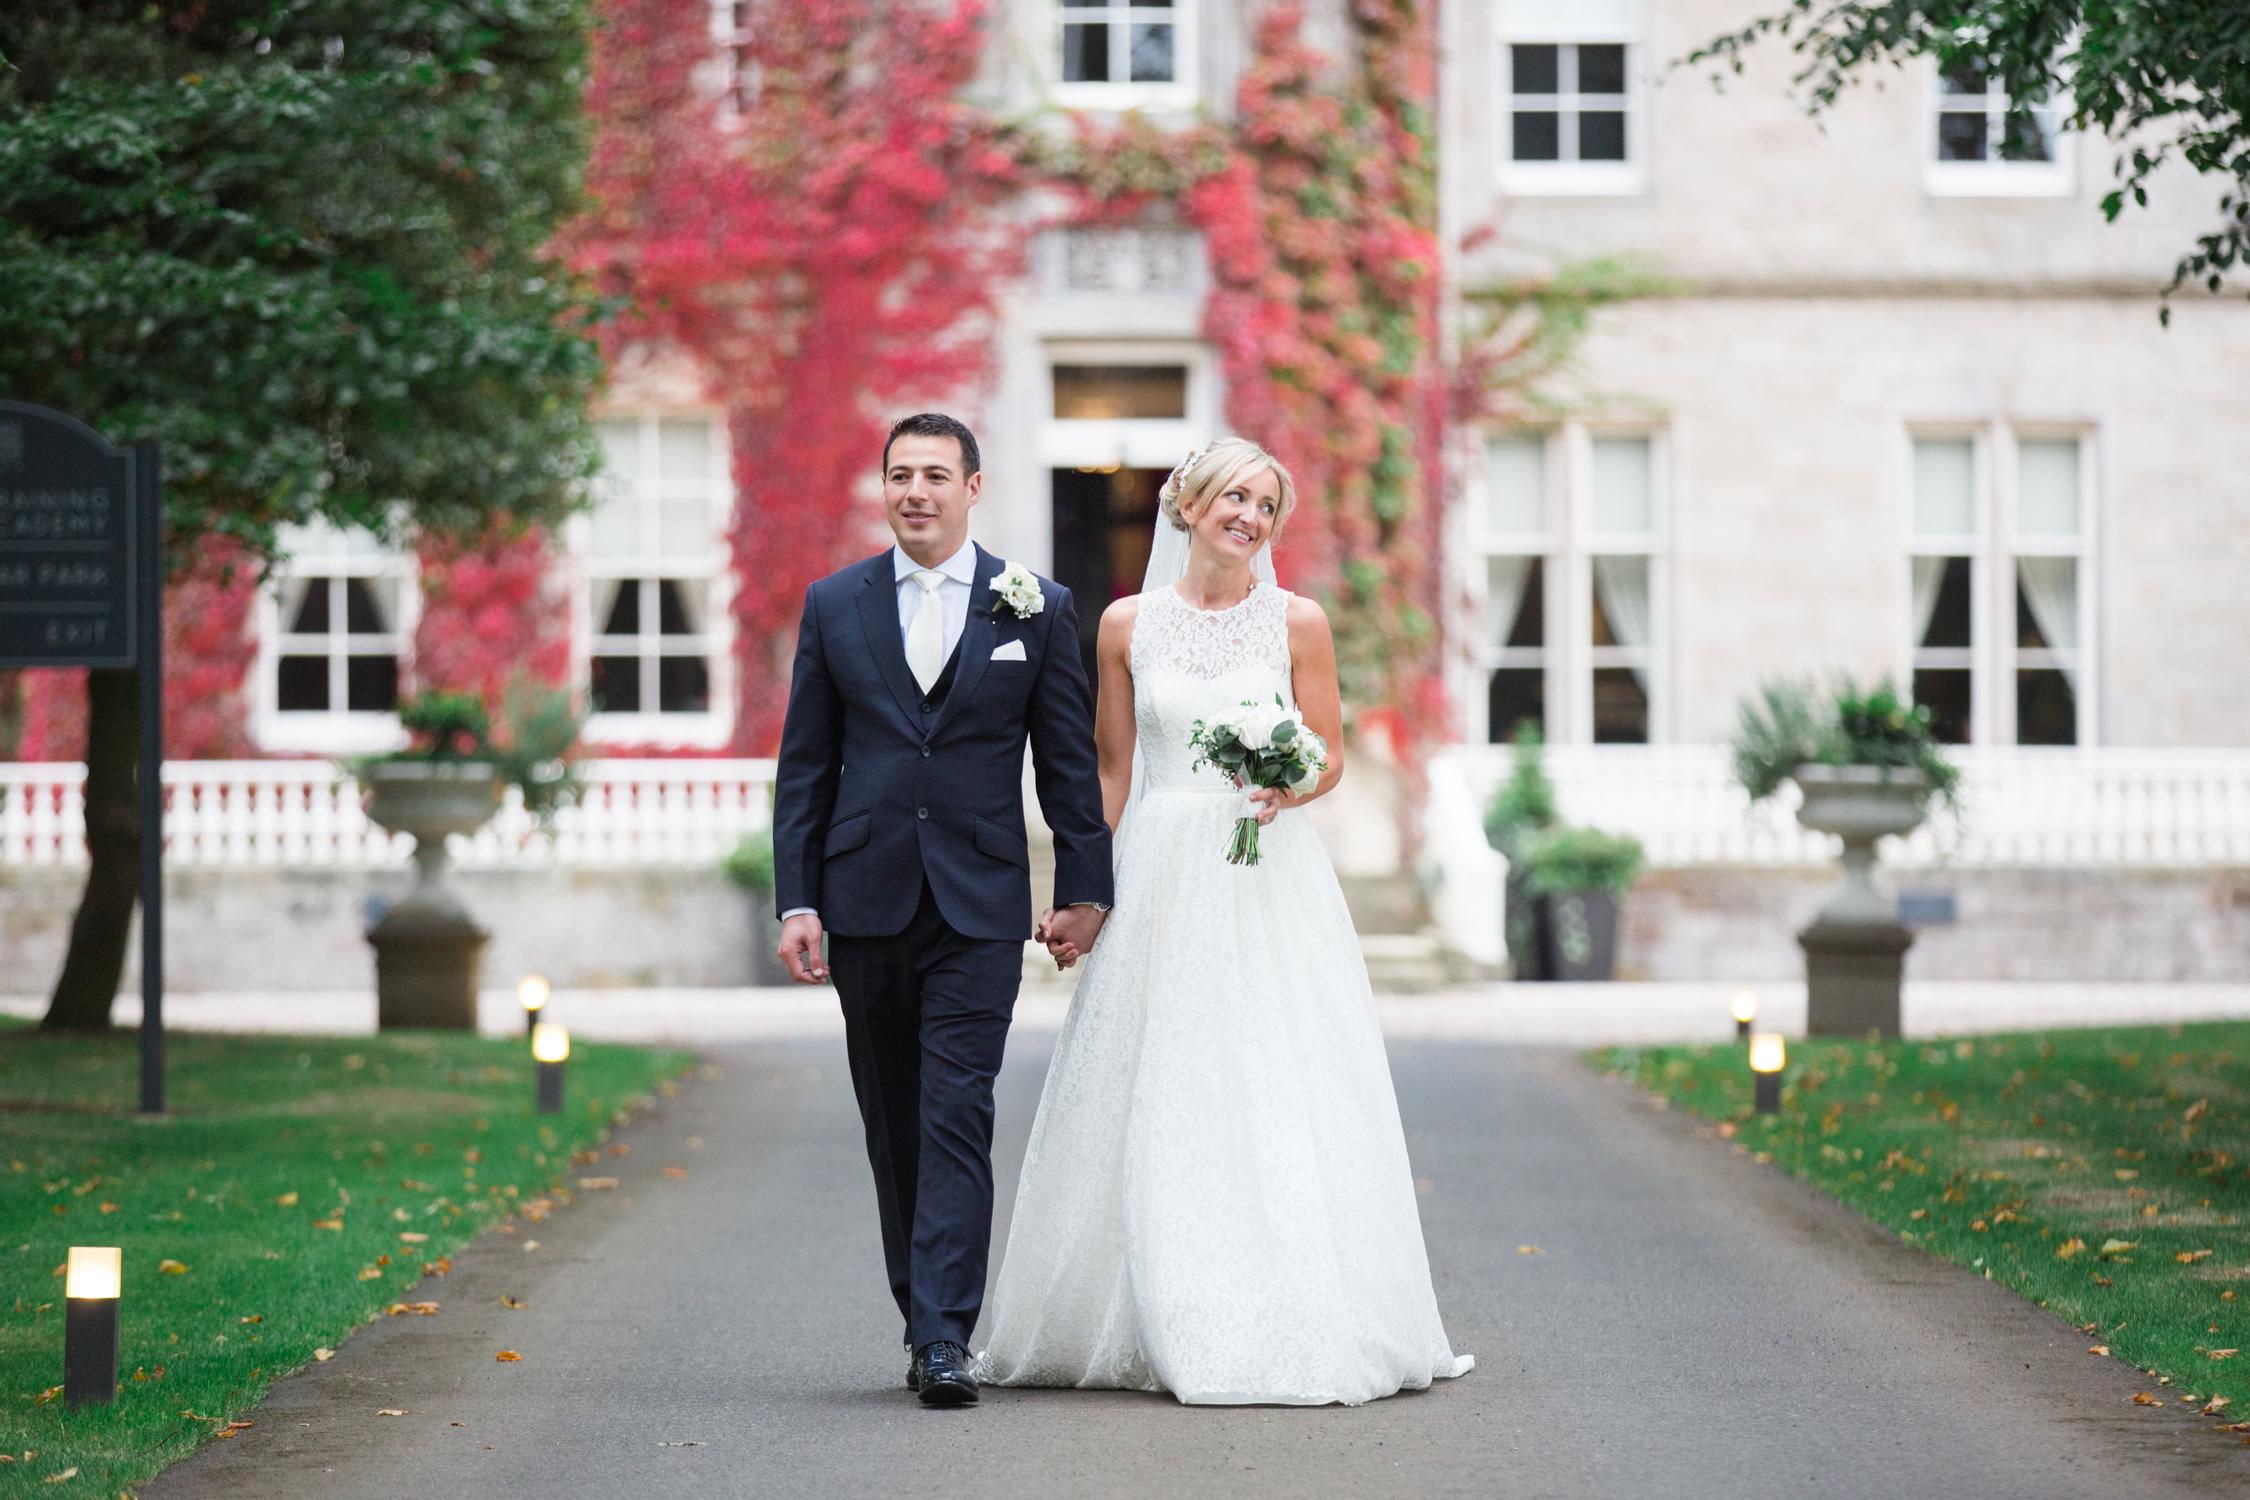 An Elegant wedding at Carlowrie Castle in Edinburgh